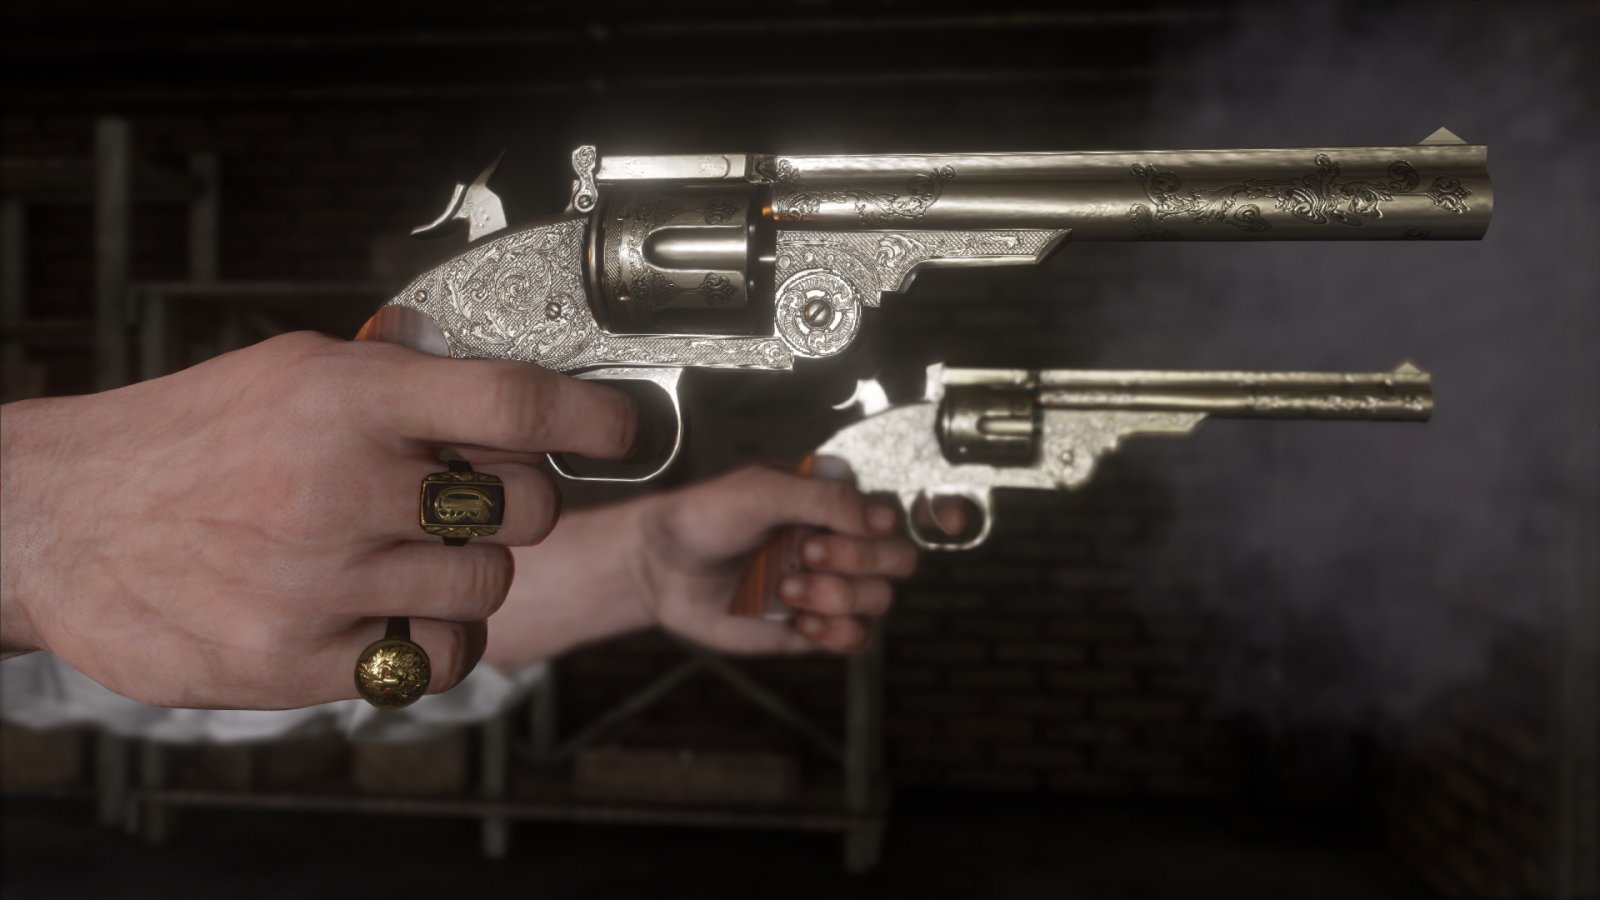 Red Dead Redemption 2 - Revolvers